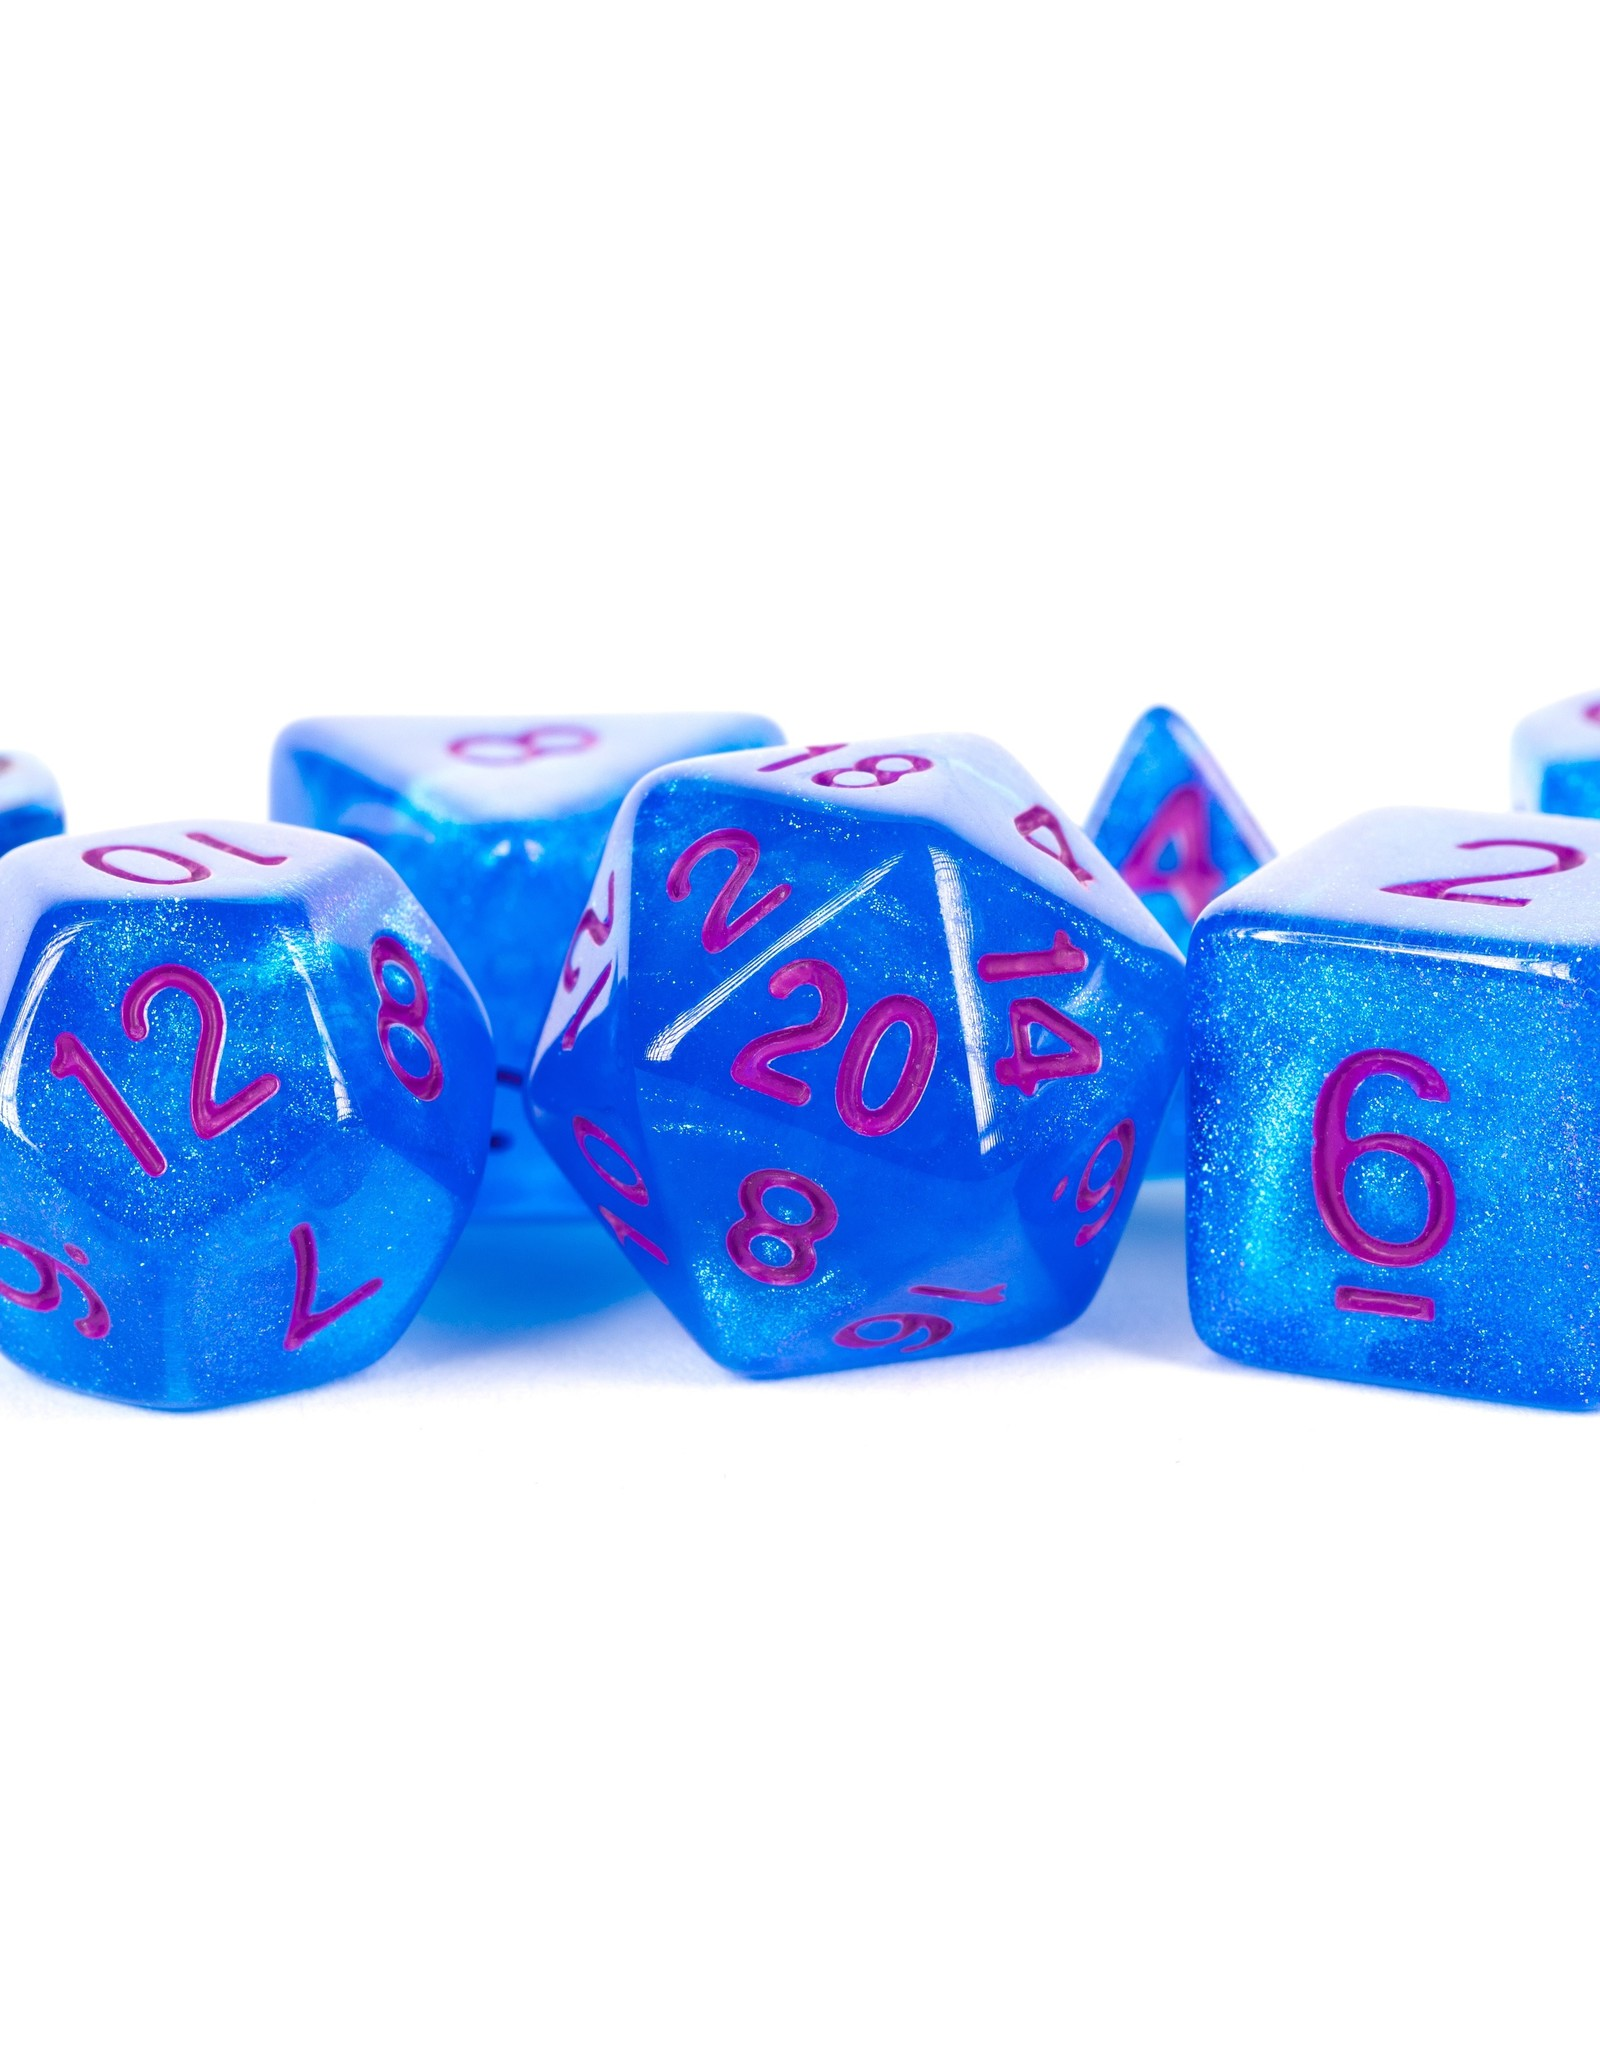 MDG Stardust: Blue w/ Purple Numbers